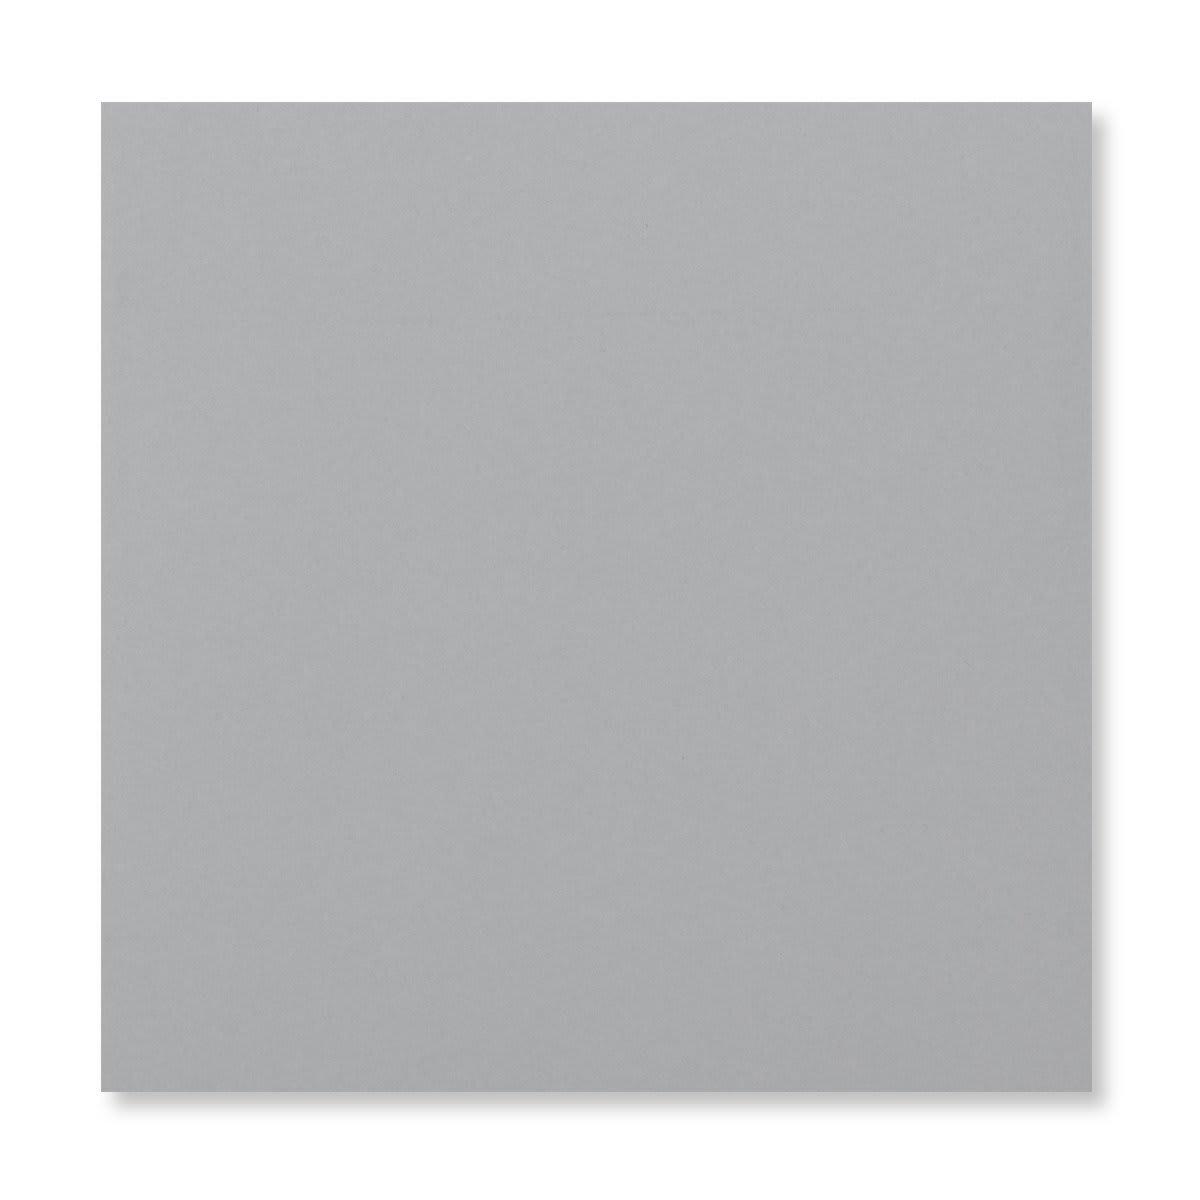 PALE GREY 155MM SQUARE PEEL & SEAL ENVELOPES